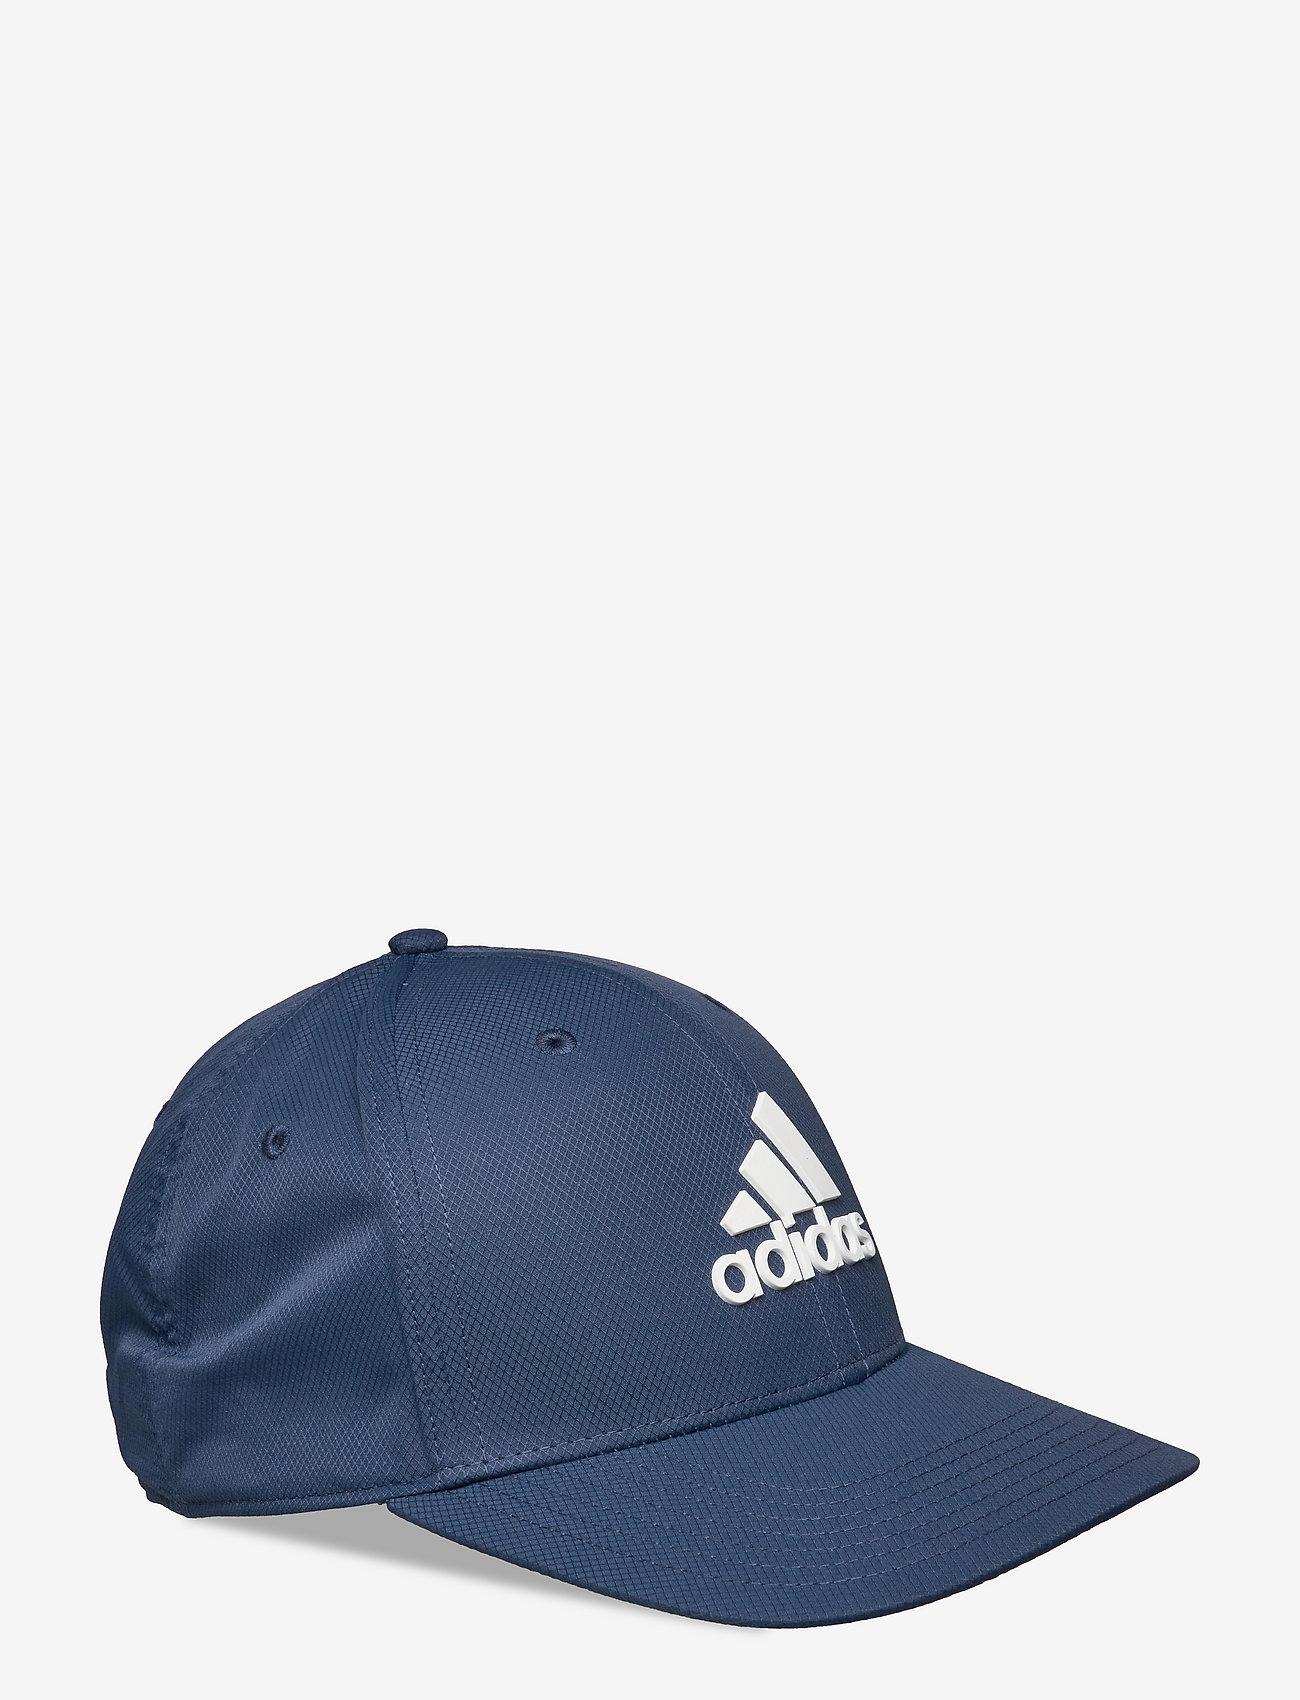 adidas Golf - TOUR SNAPBACK - kepsar - crenav - 0